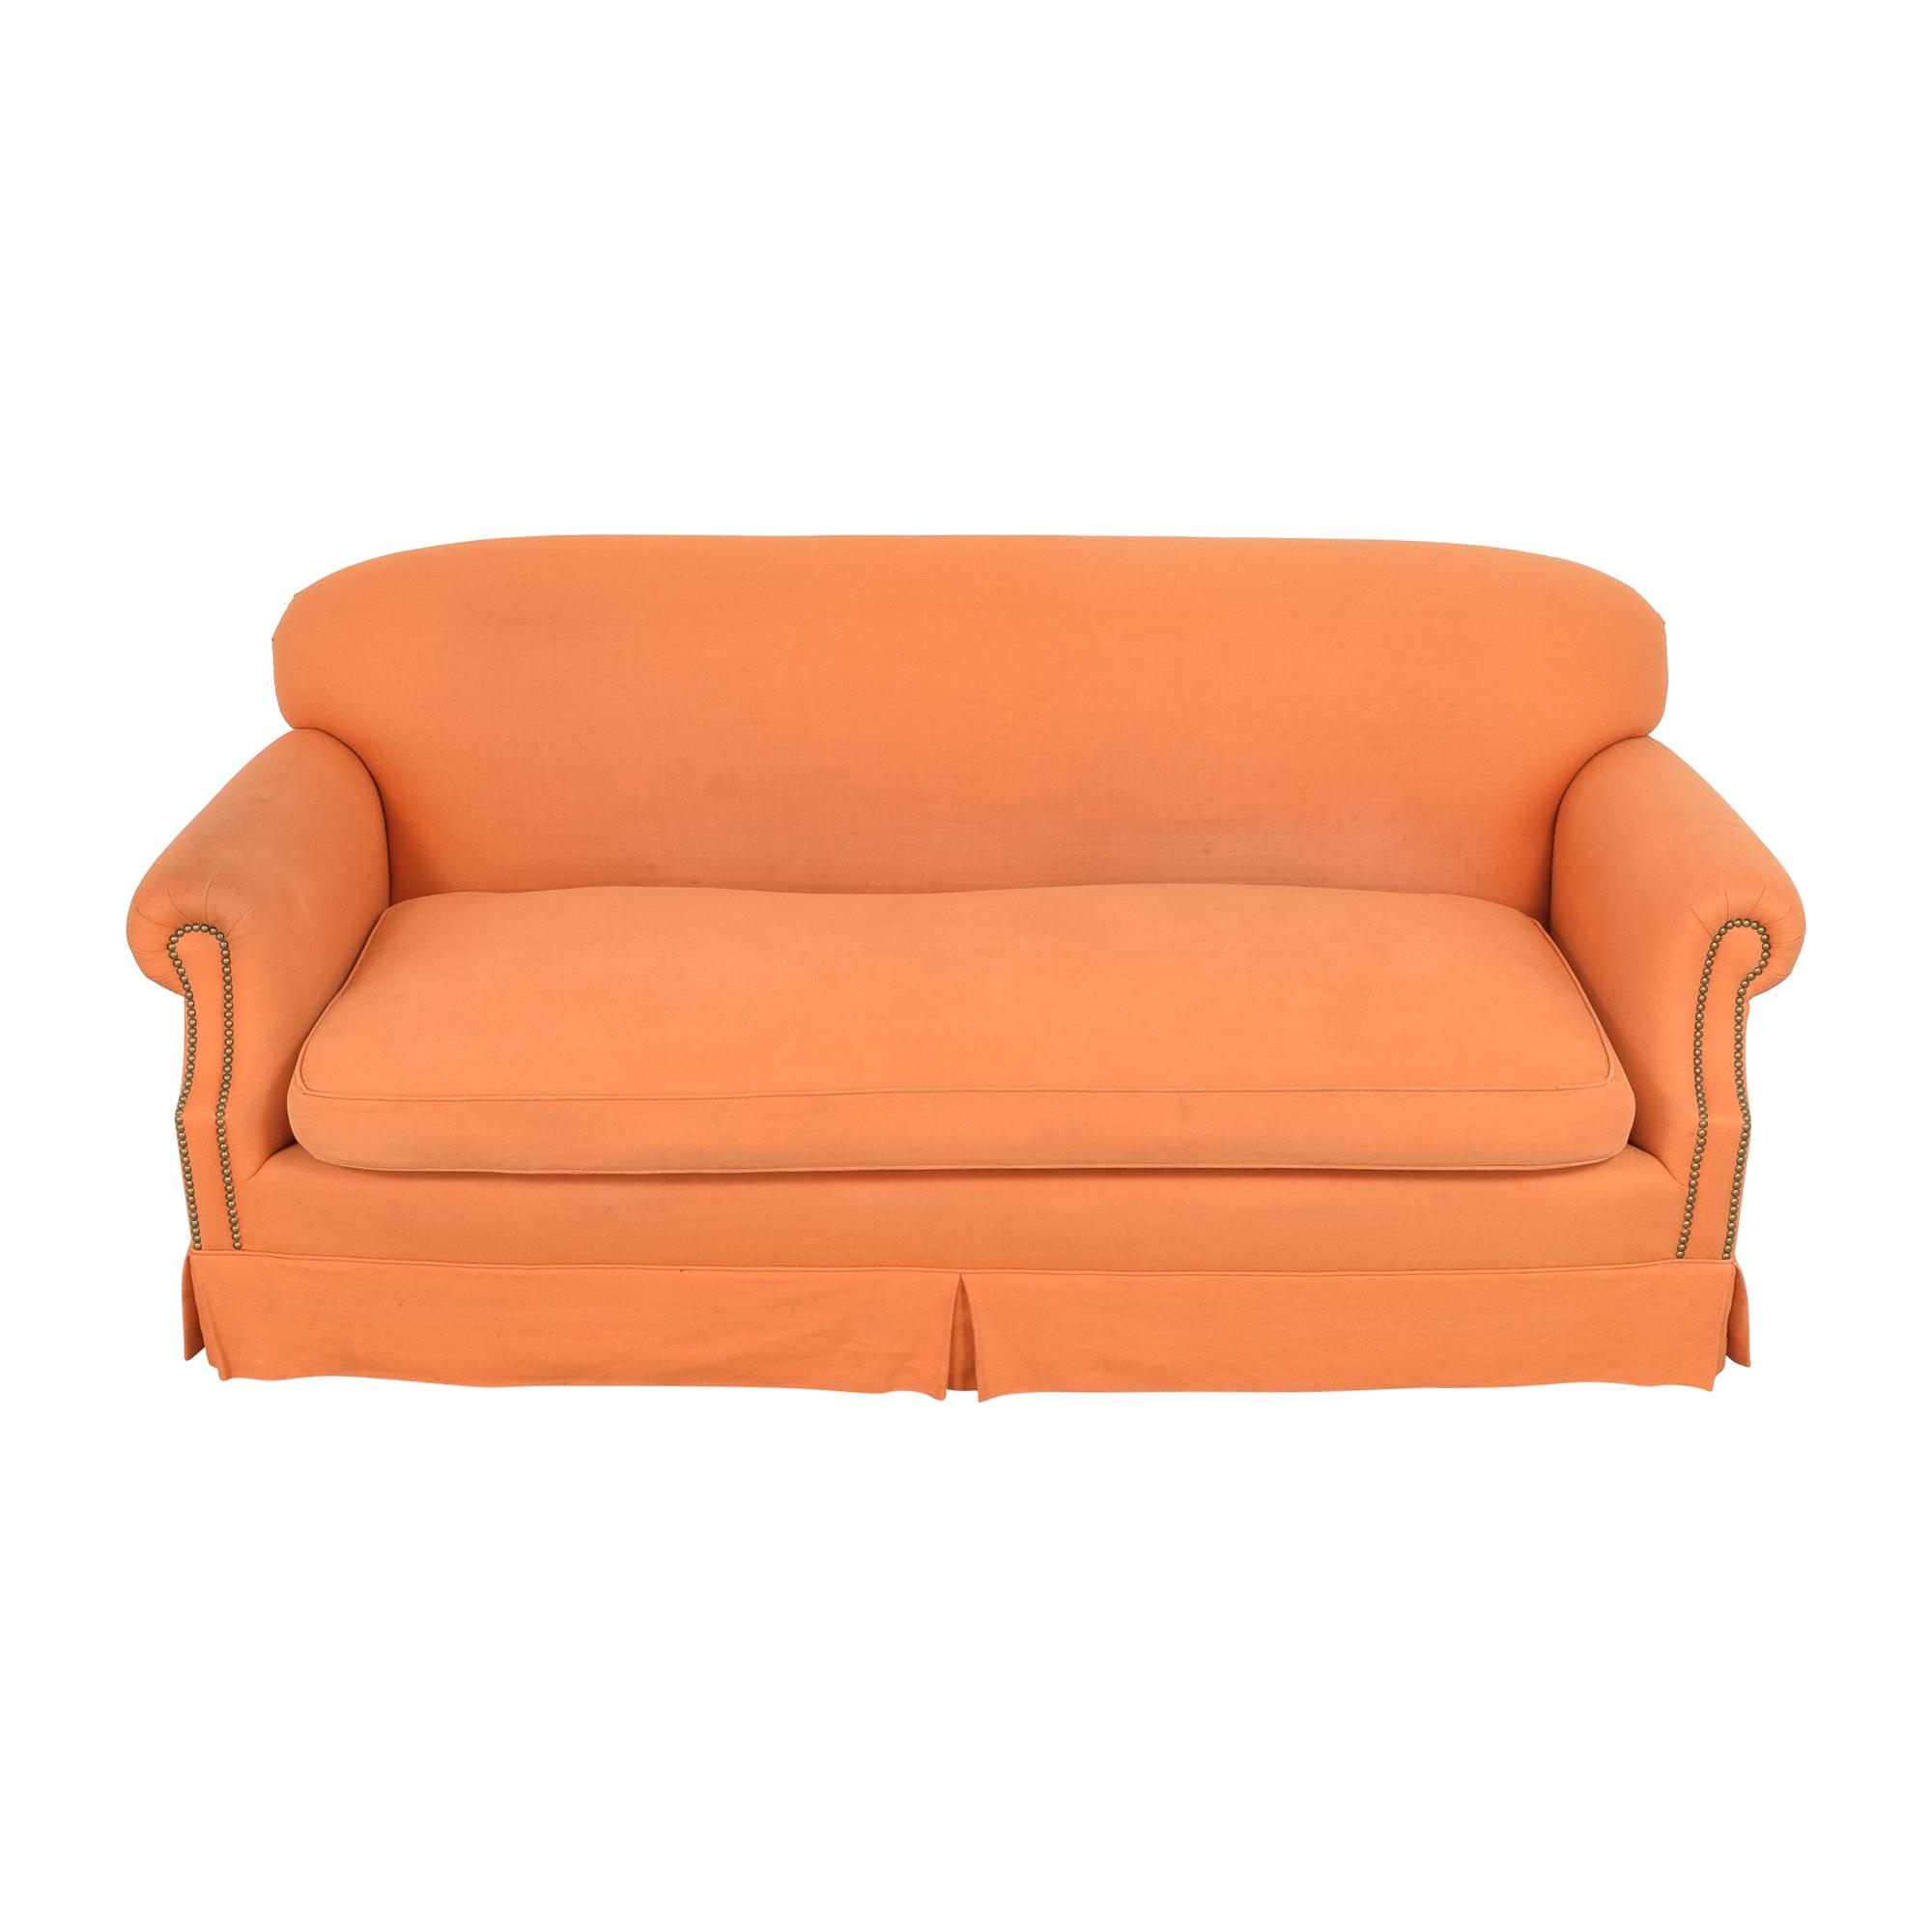 George Smith George Smith Bench Cushion Sofa nj